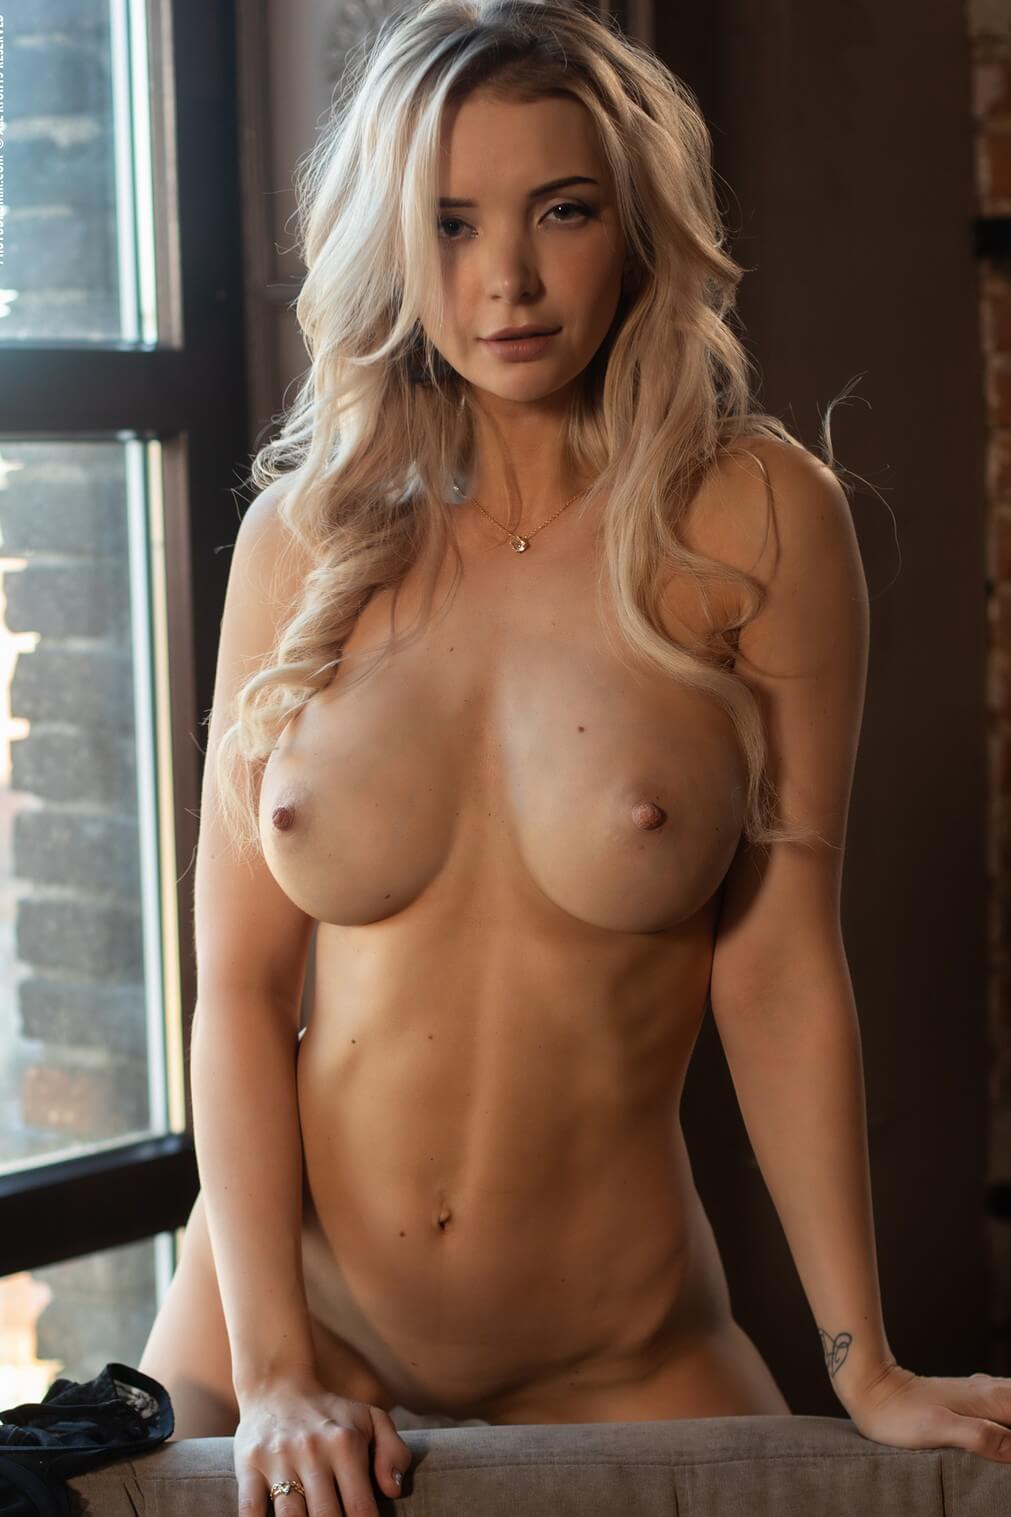 Busty nude models